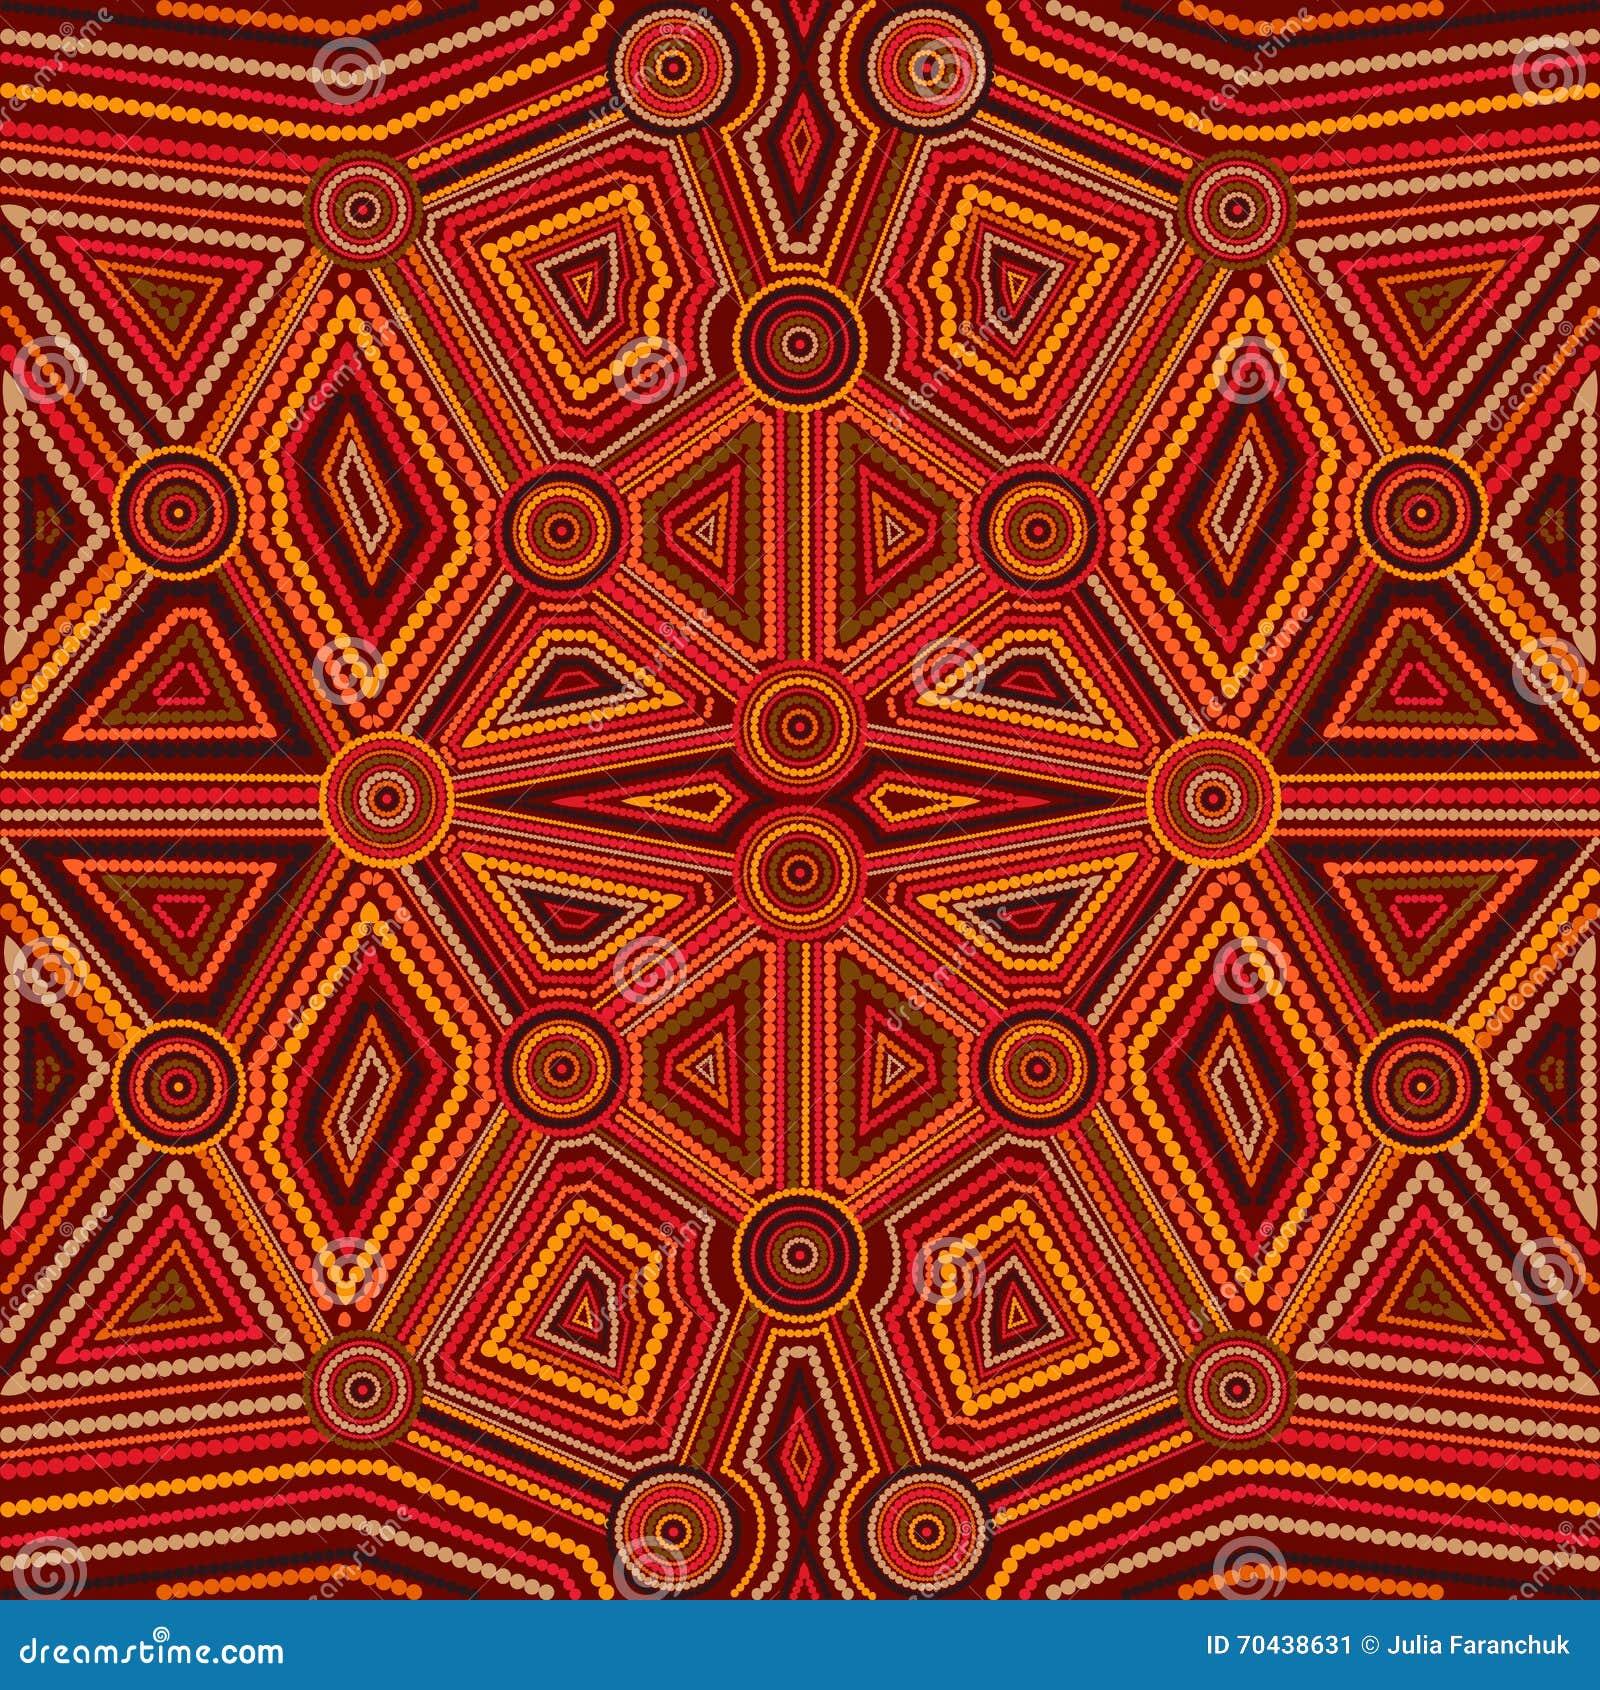 Abstract style of australian aboriginal art stock illustration abstract style of australian aboriginal art toneelgroepblik Image collections